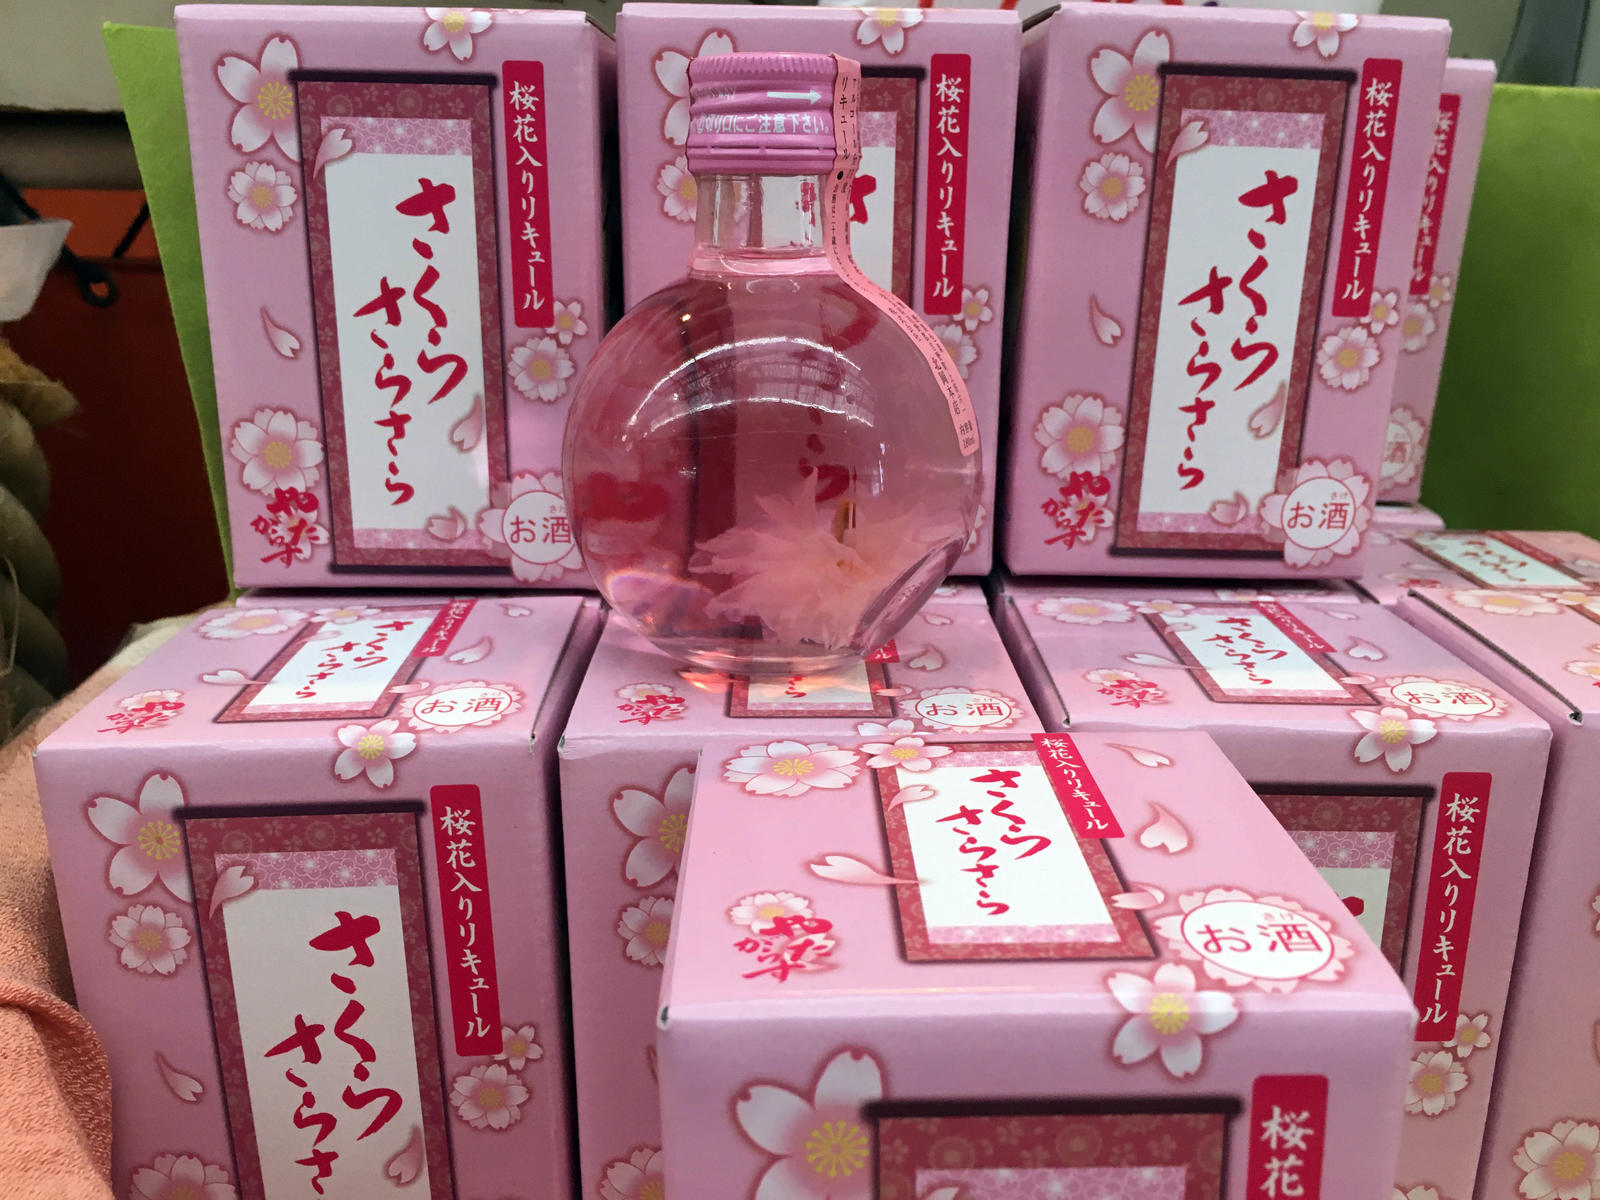 sake 2020 sakura cherry blossom snacks japan